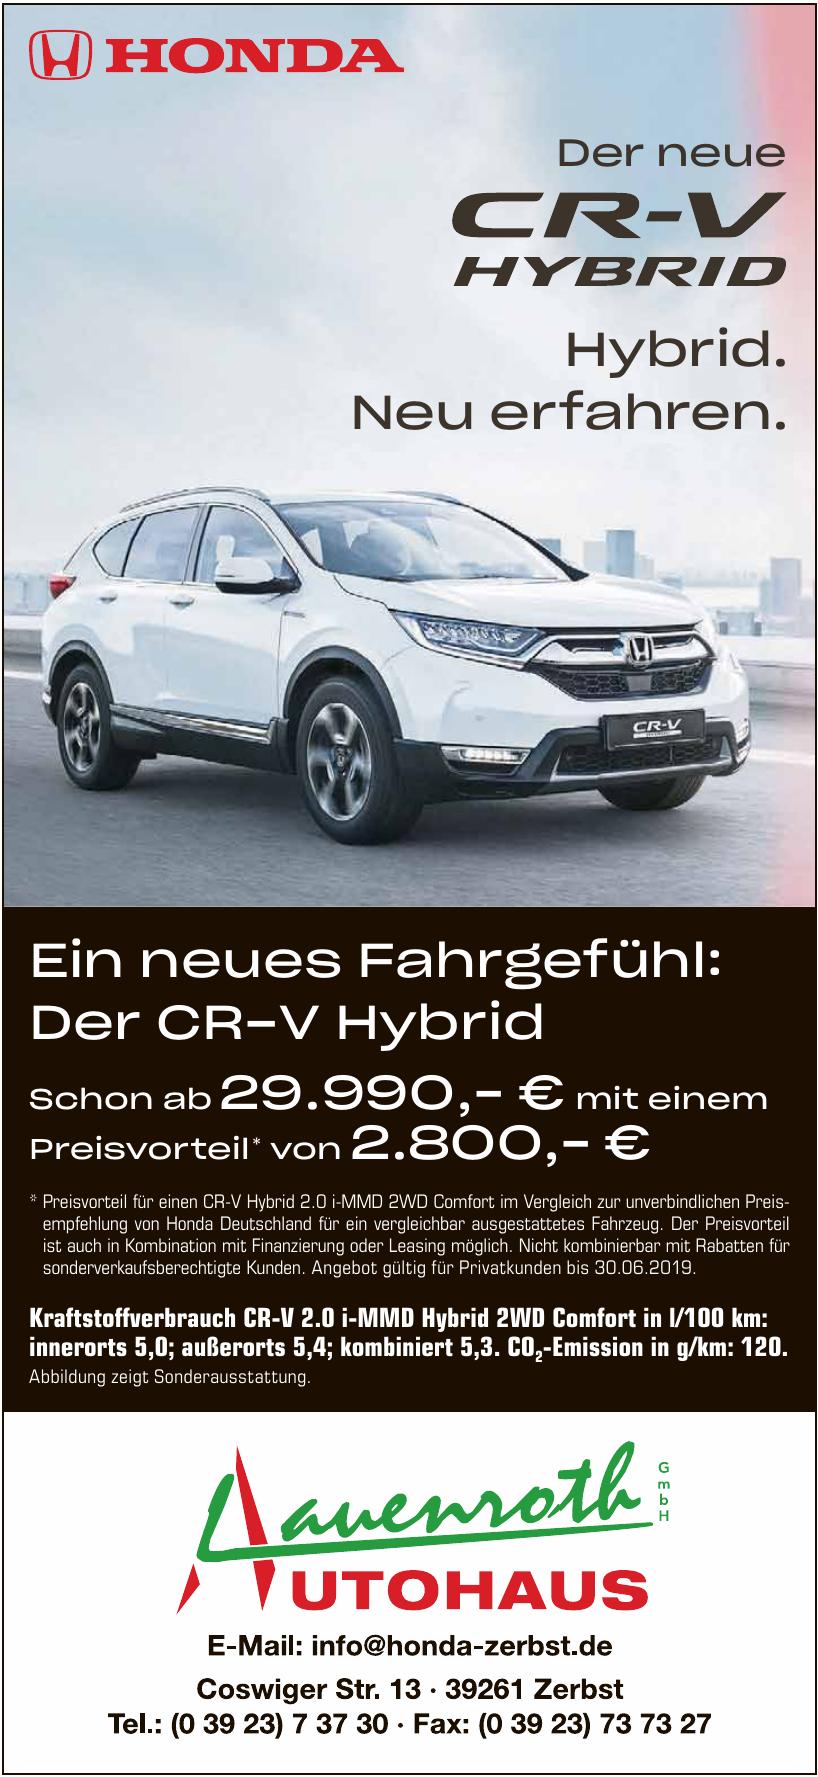 Autohaus Lauenroth GmbH